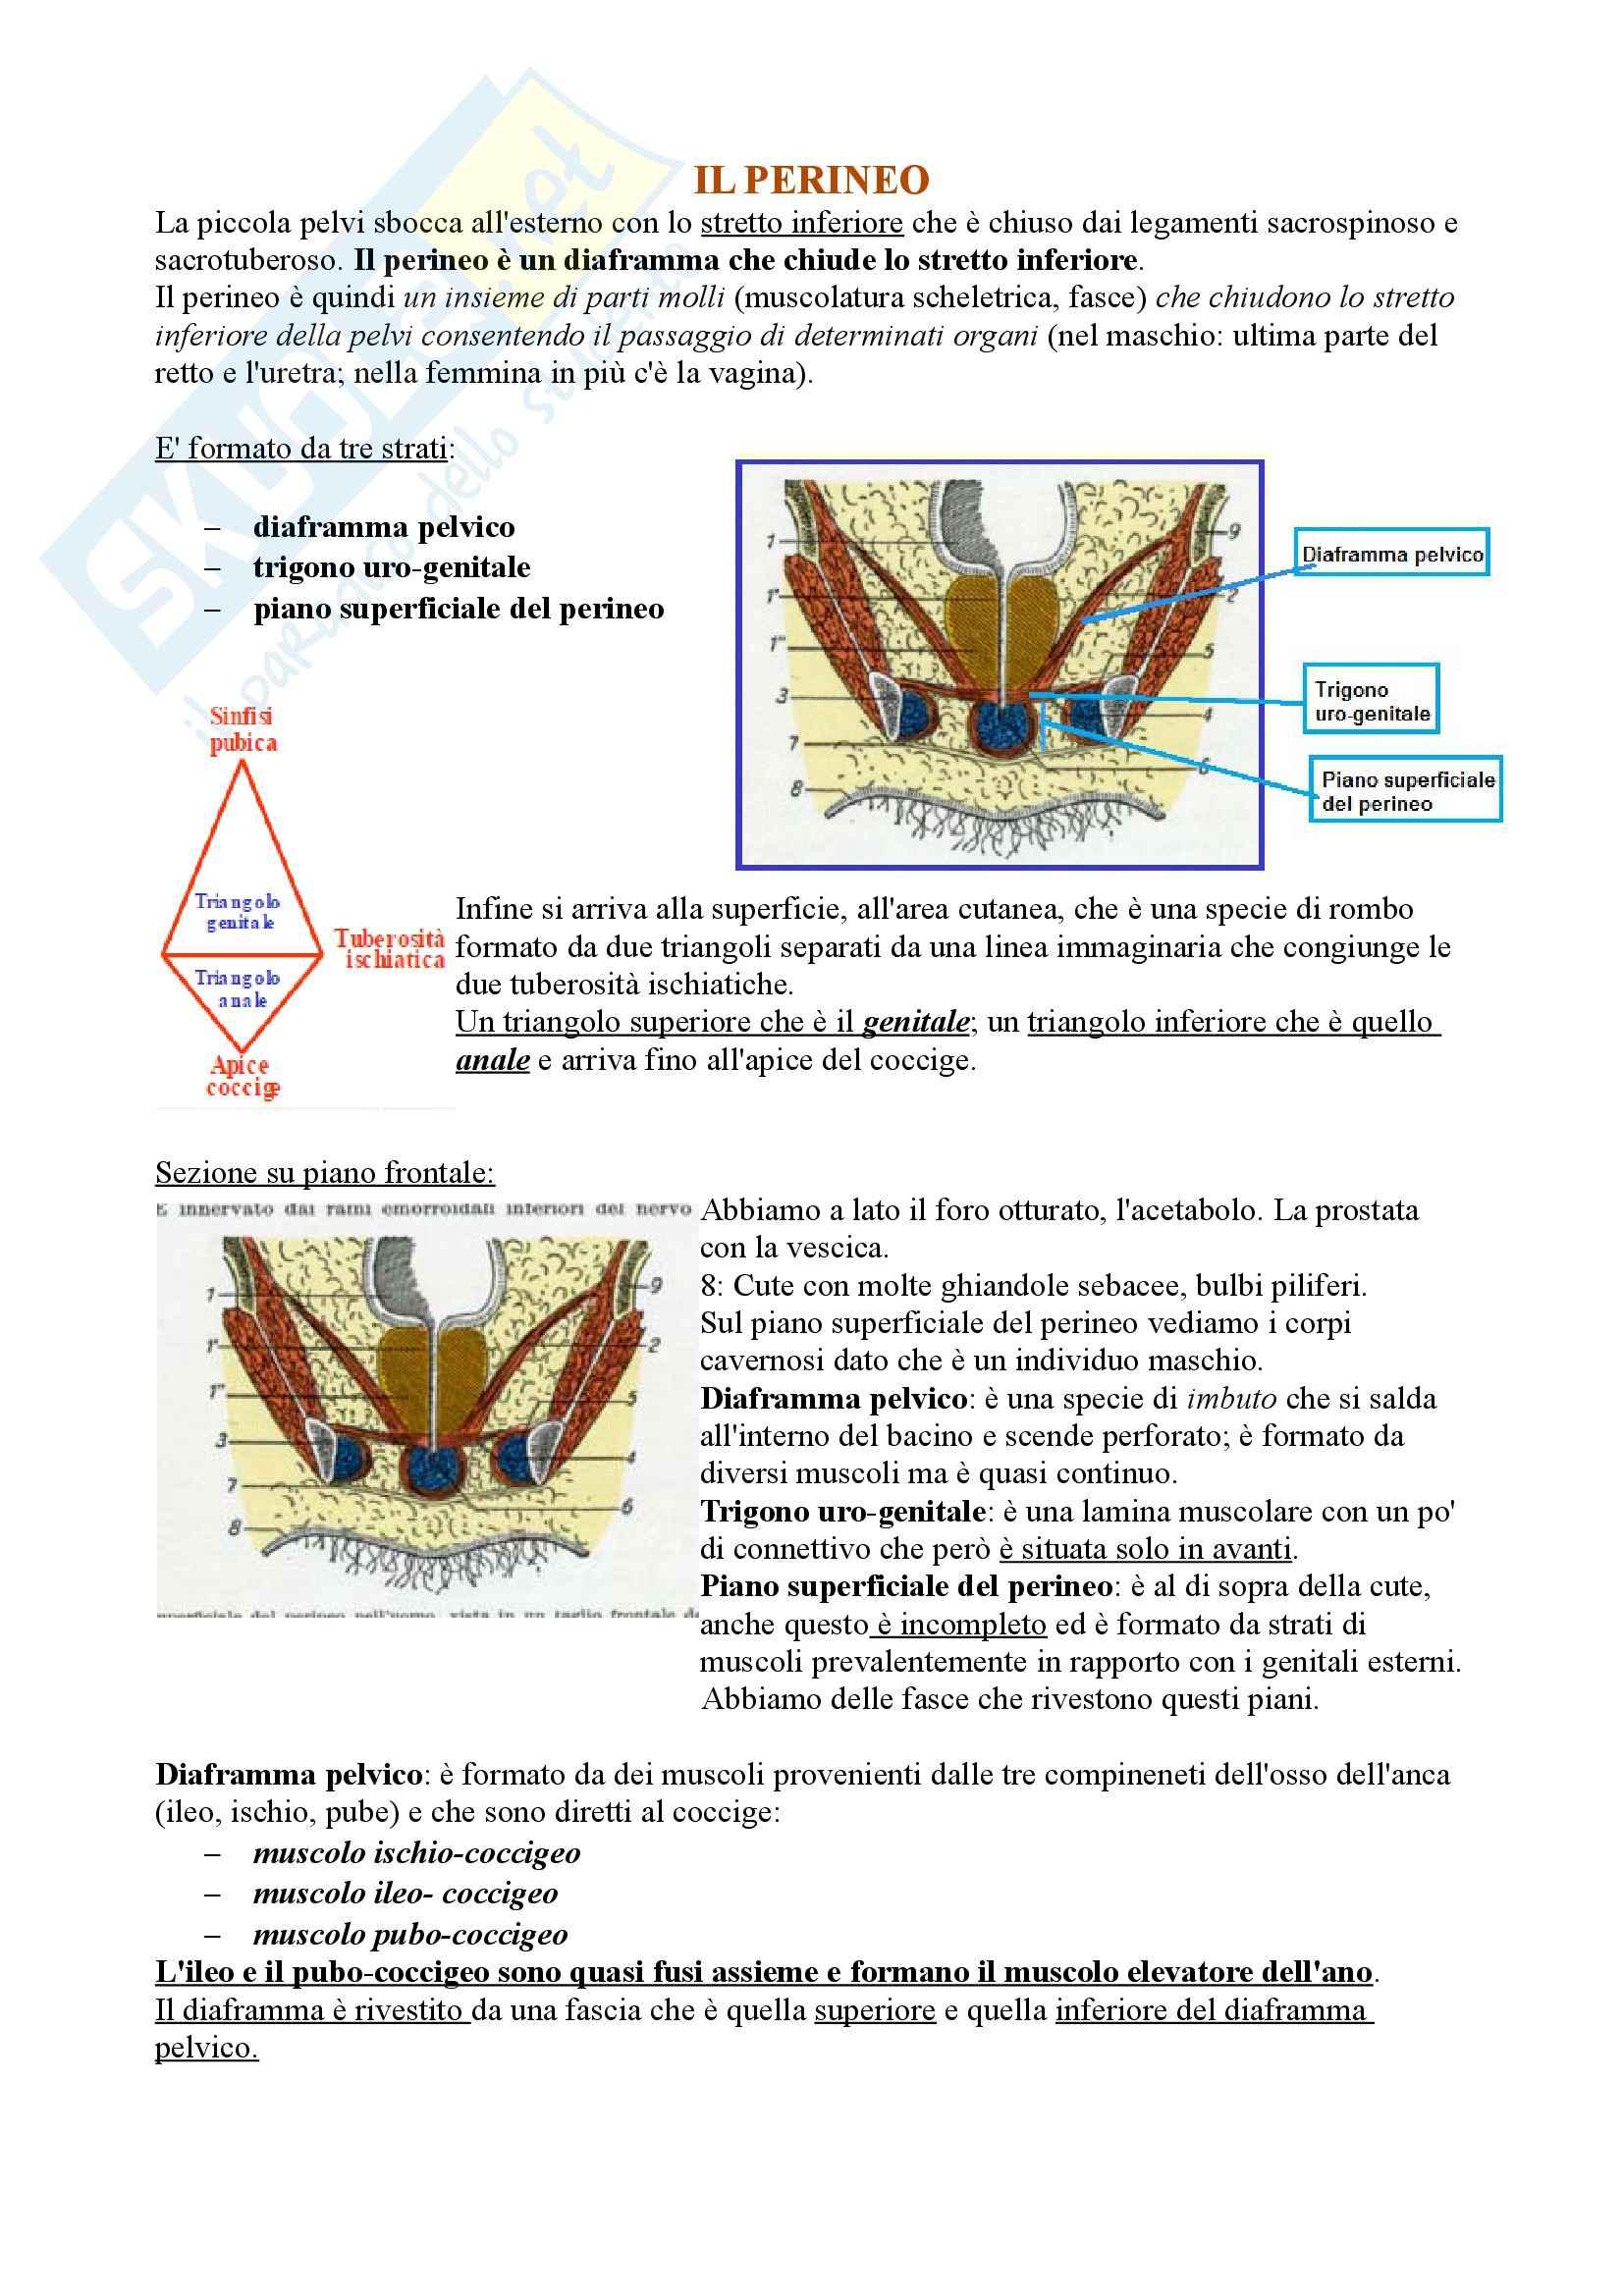 Perineo, Anatomia